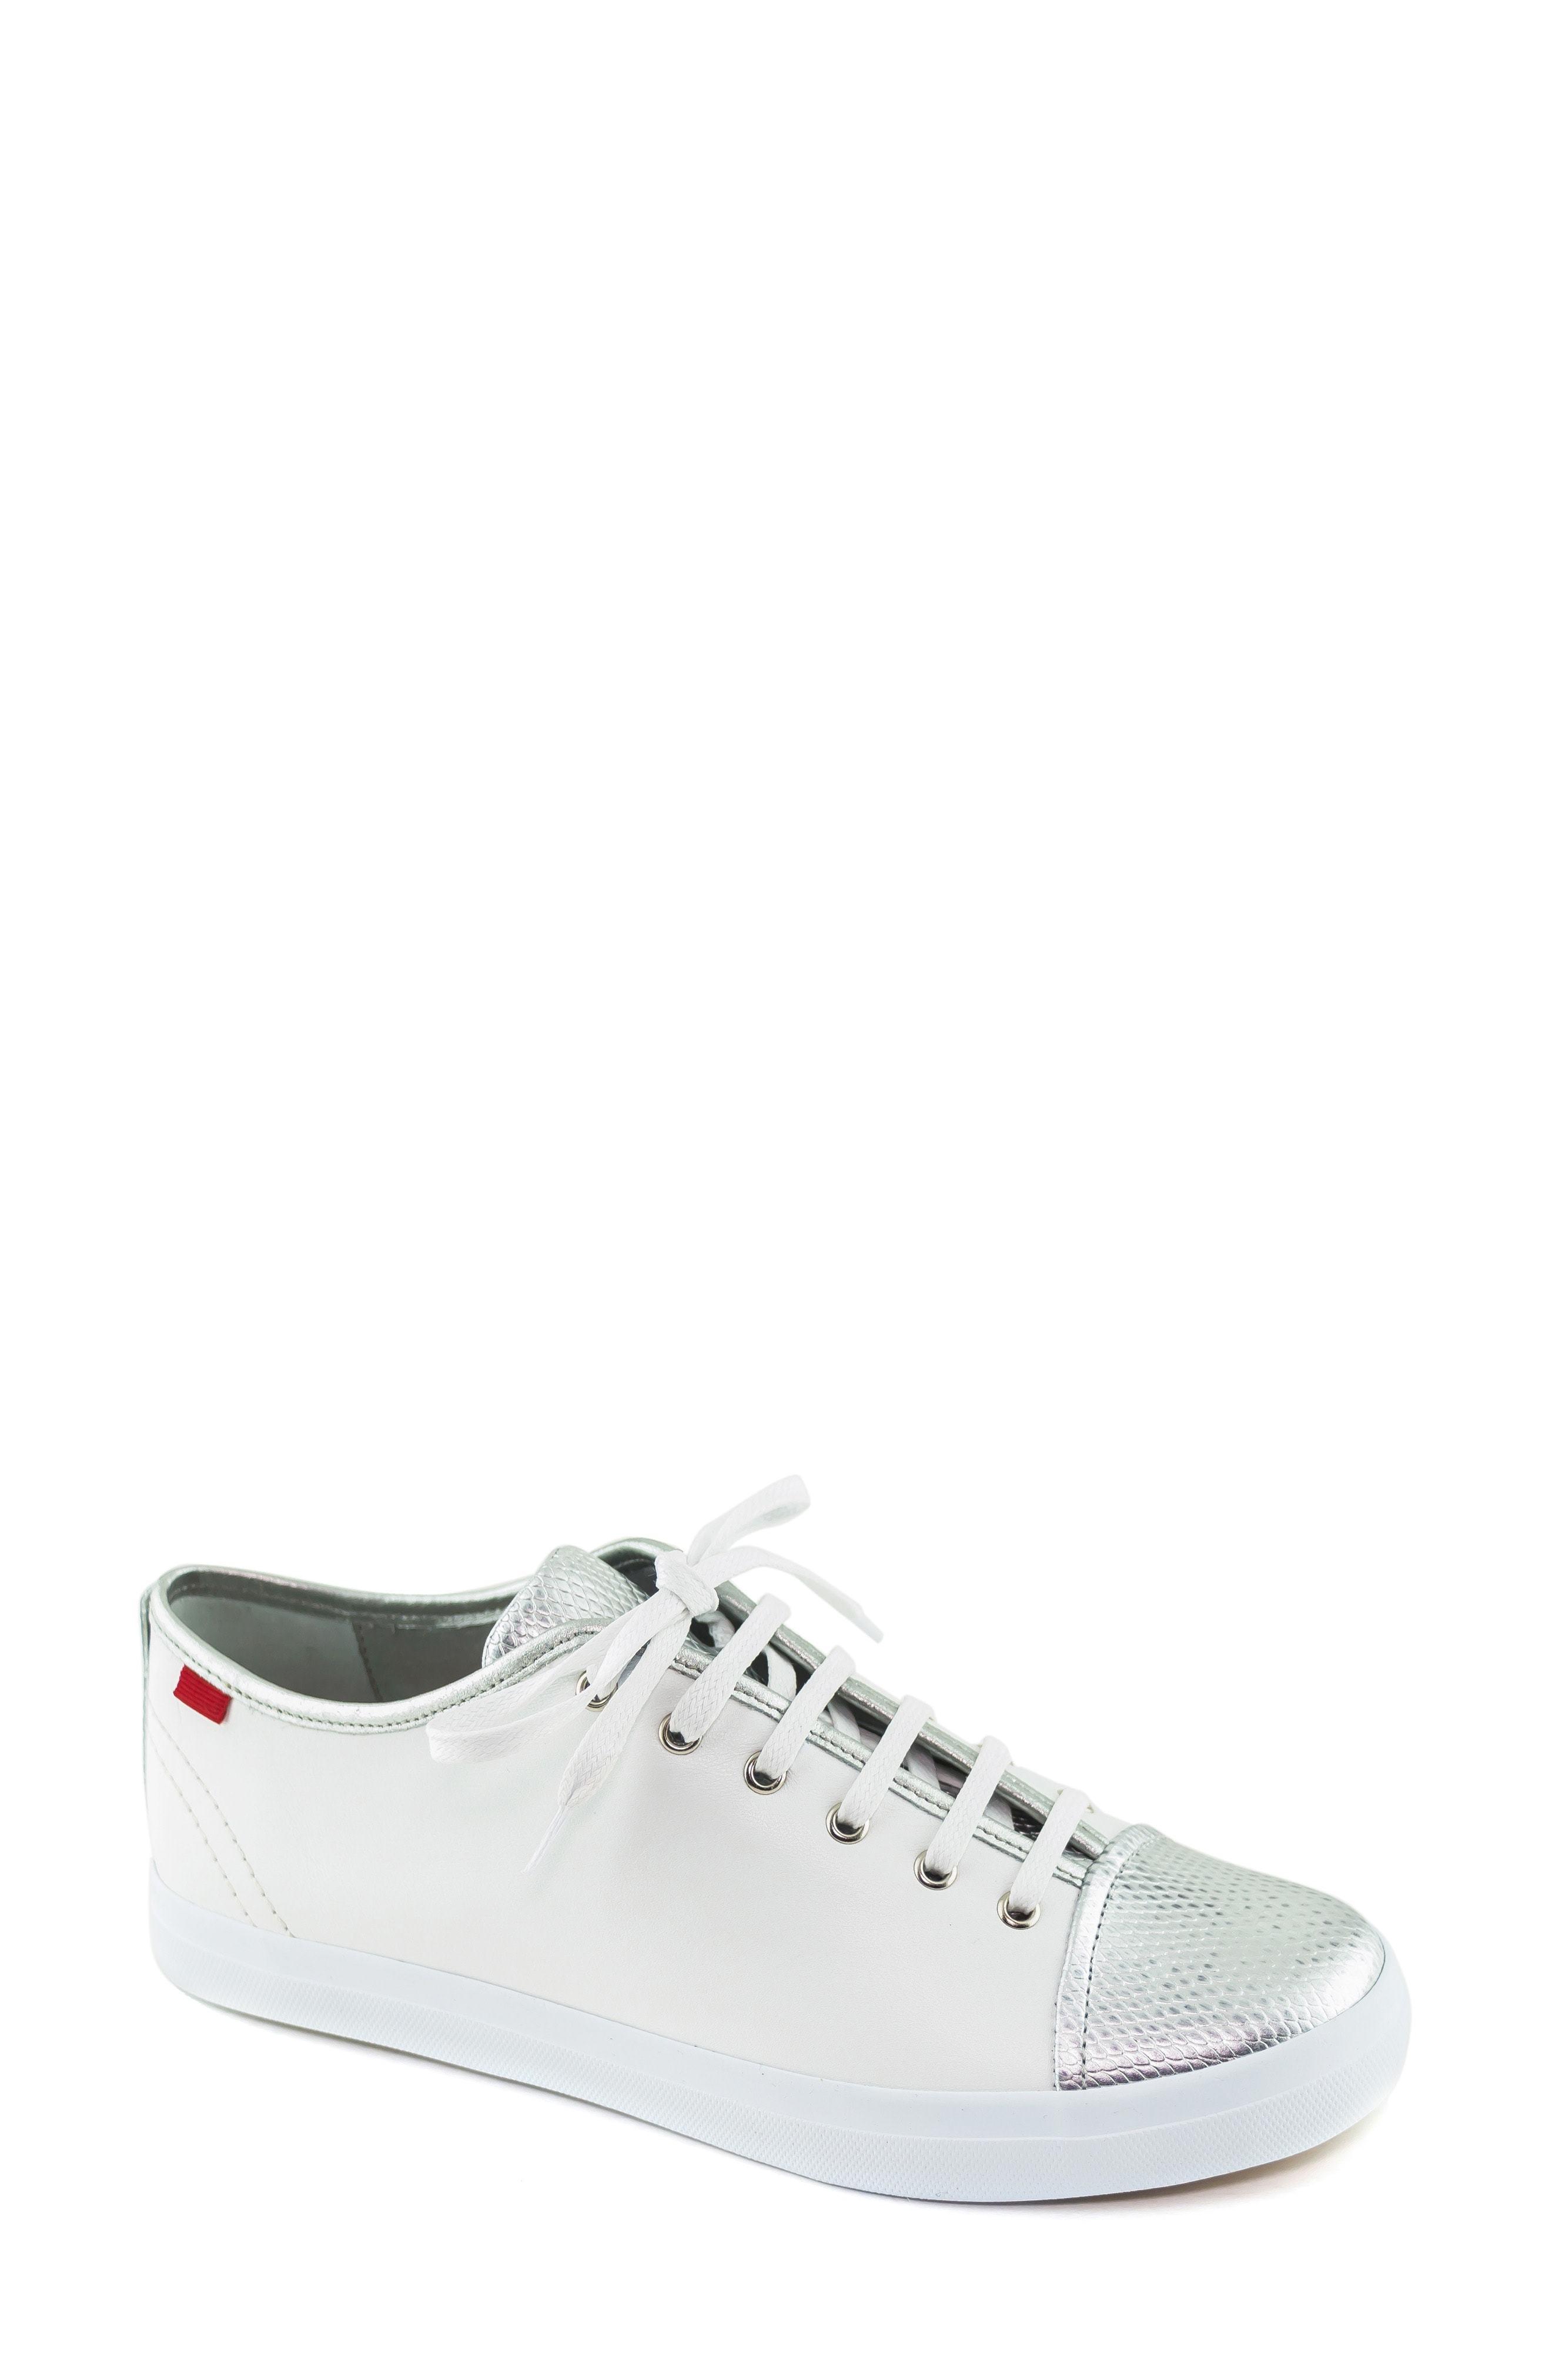 Marc Joseph New York Bleecker Street Sneaker